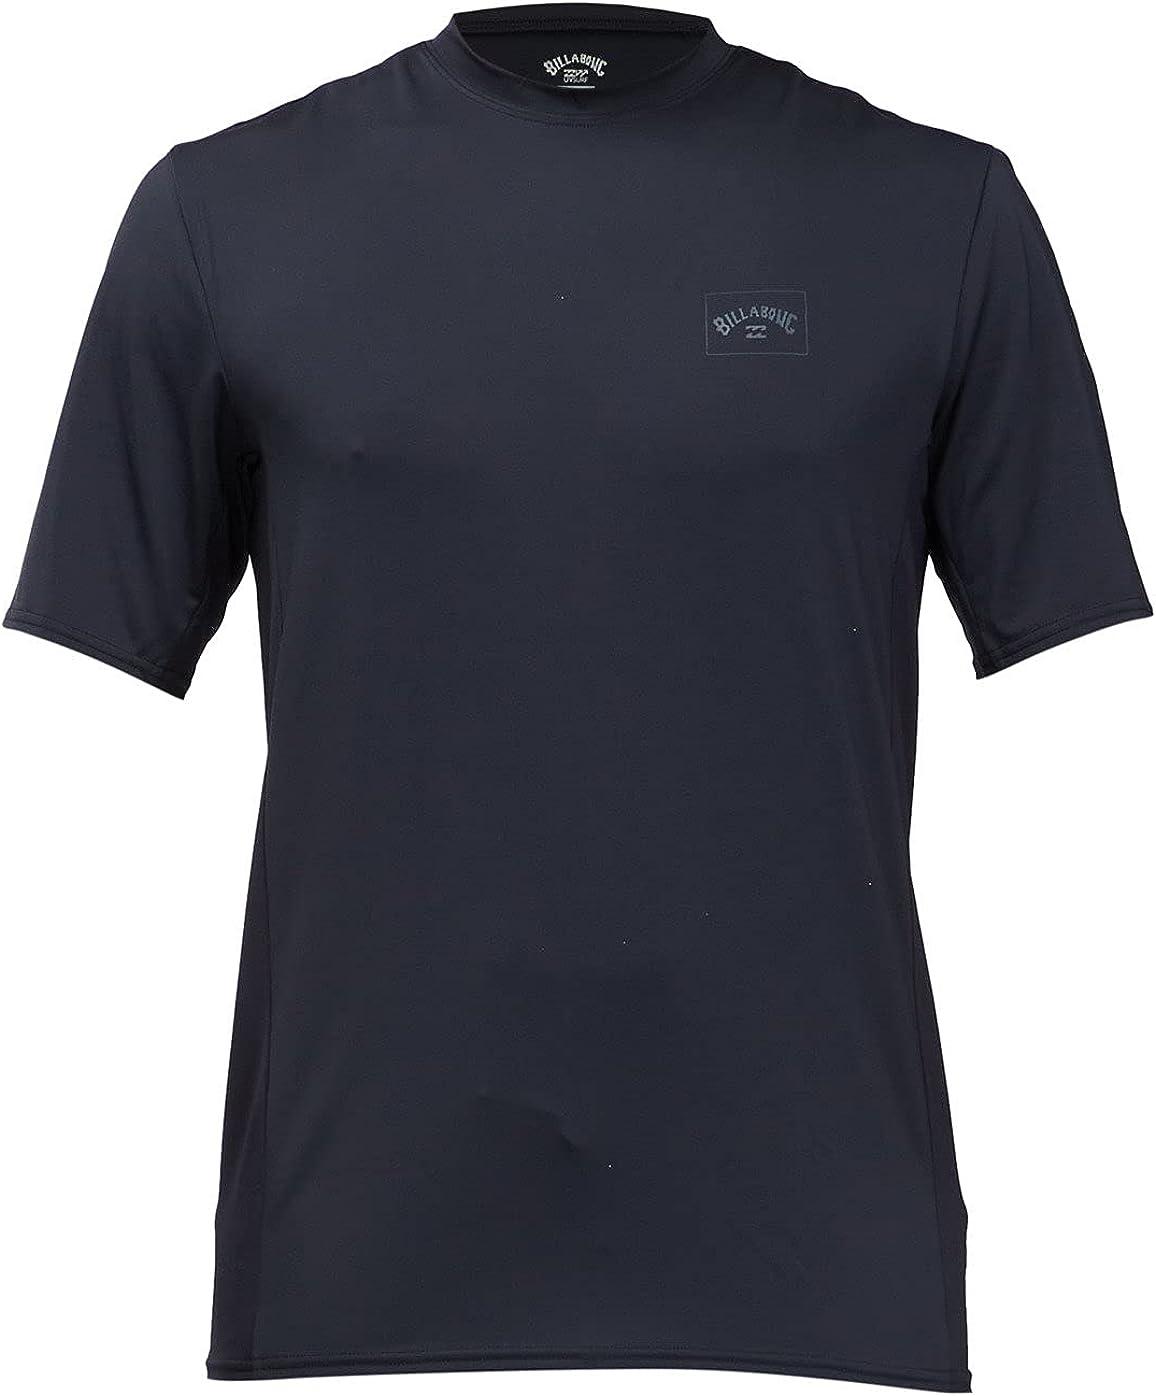 Billabong Men's Standard Arch Mesh Loose Fit Short Sleeve Rashgaurd